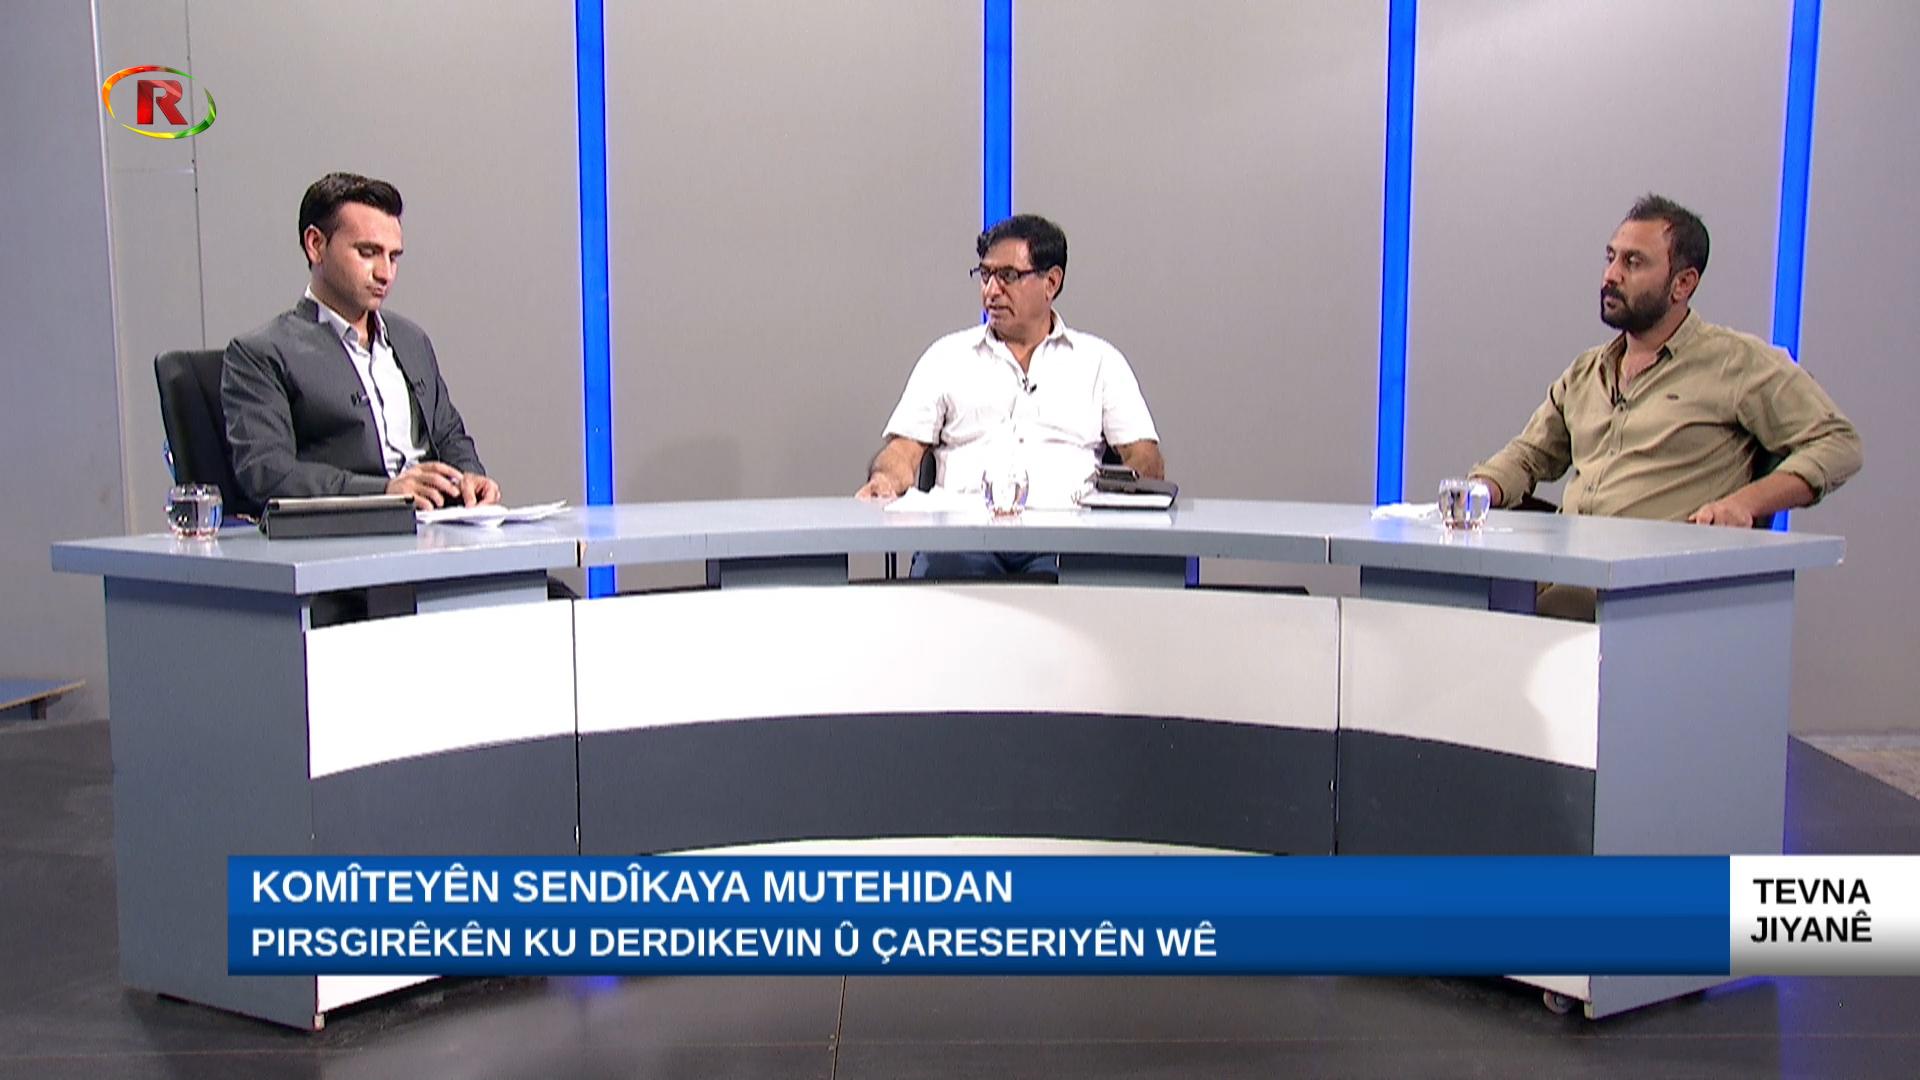 Photo of Ronahi TV – TEVNA JIYANÊ